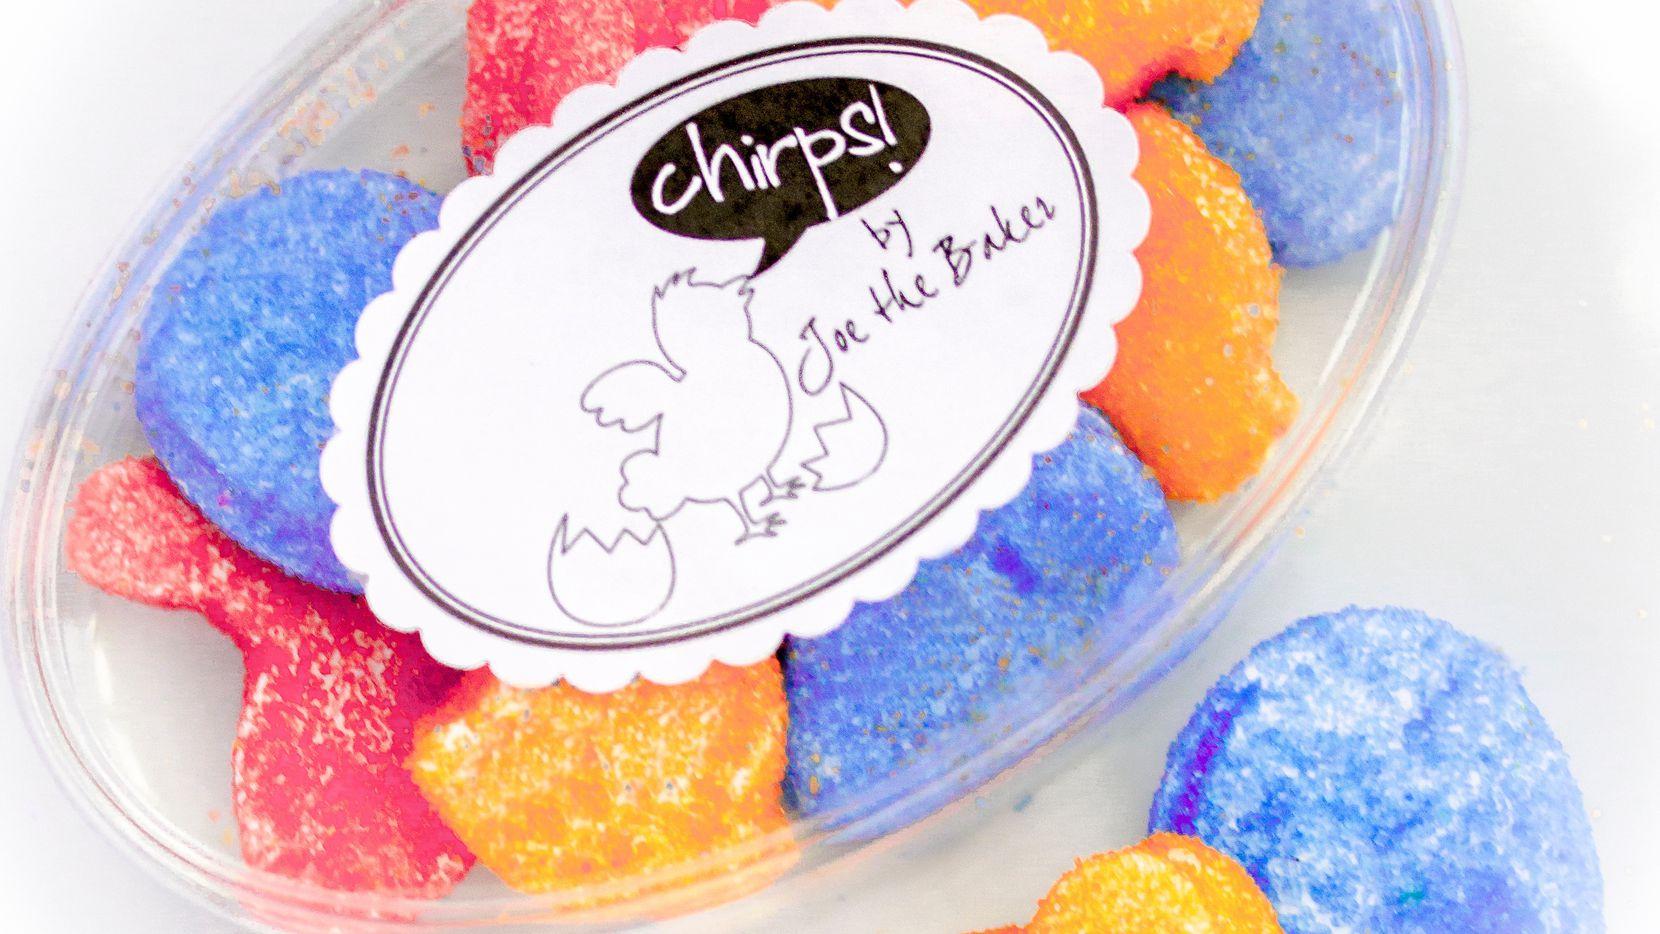 Joe the Baker's Chirps!